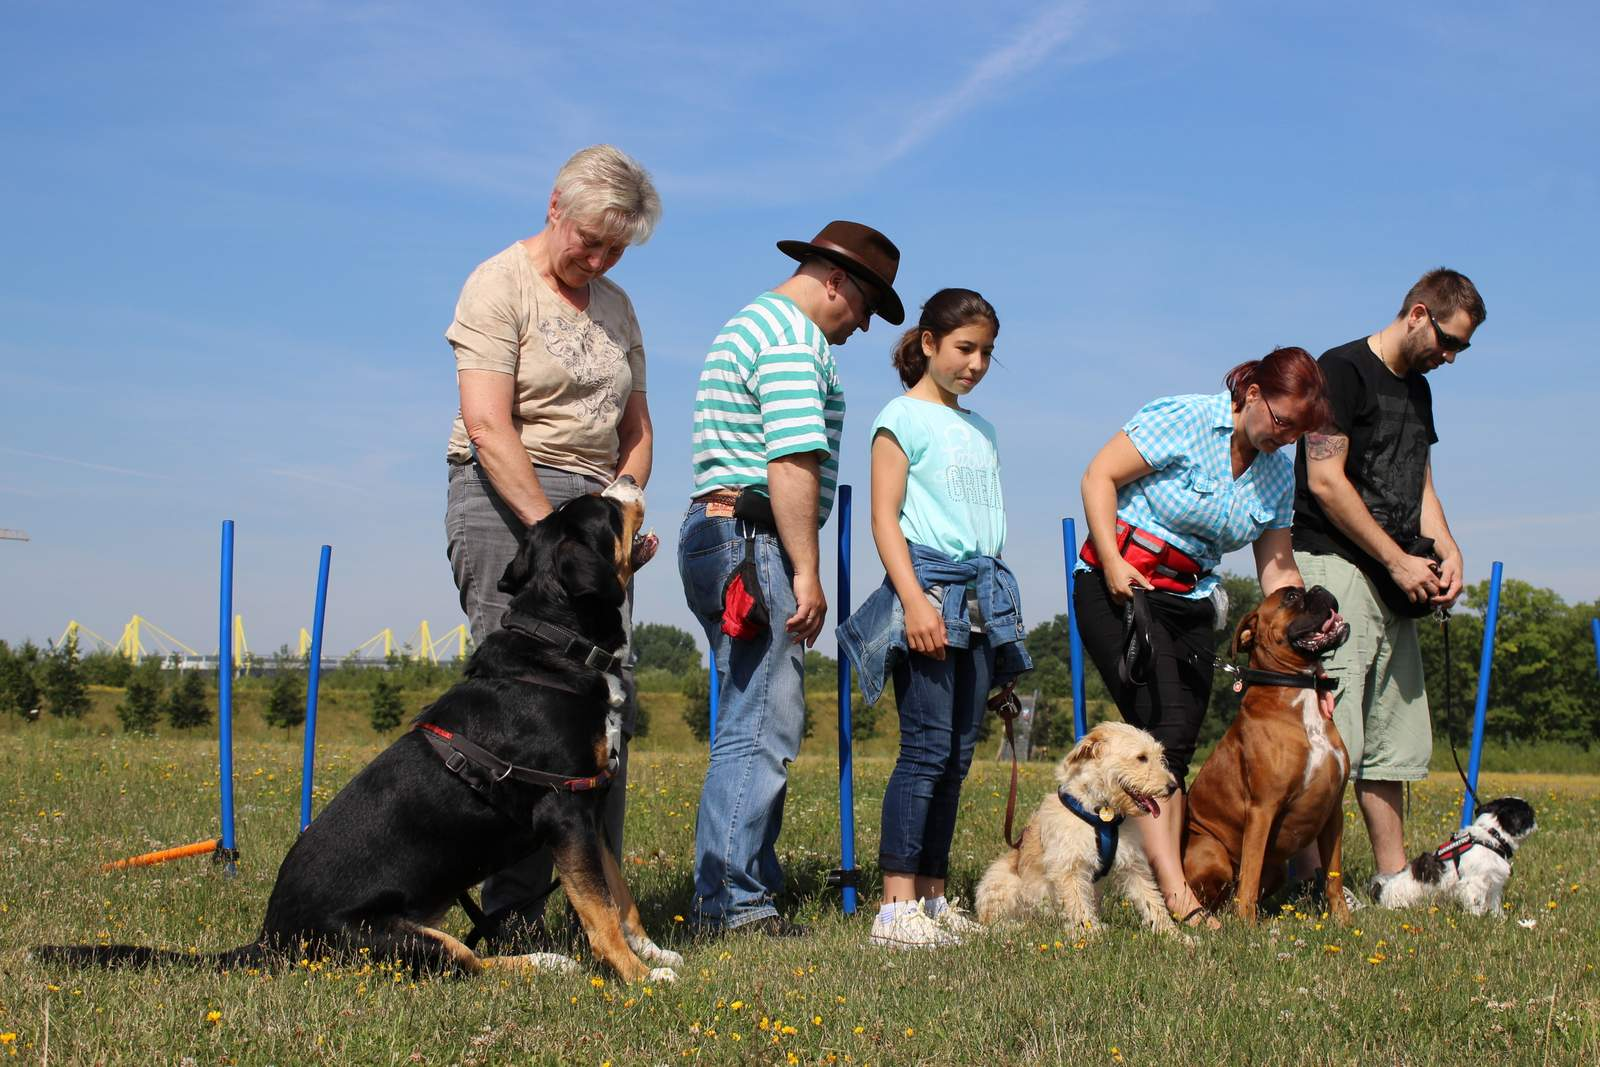 Gruppentraining,http://hundetraining-dortmund.de/